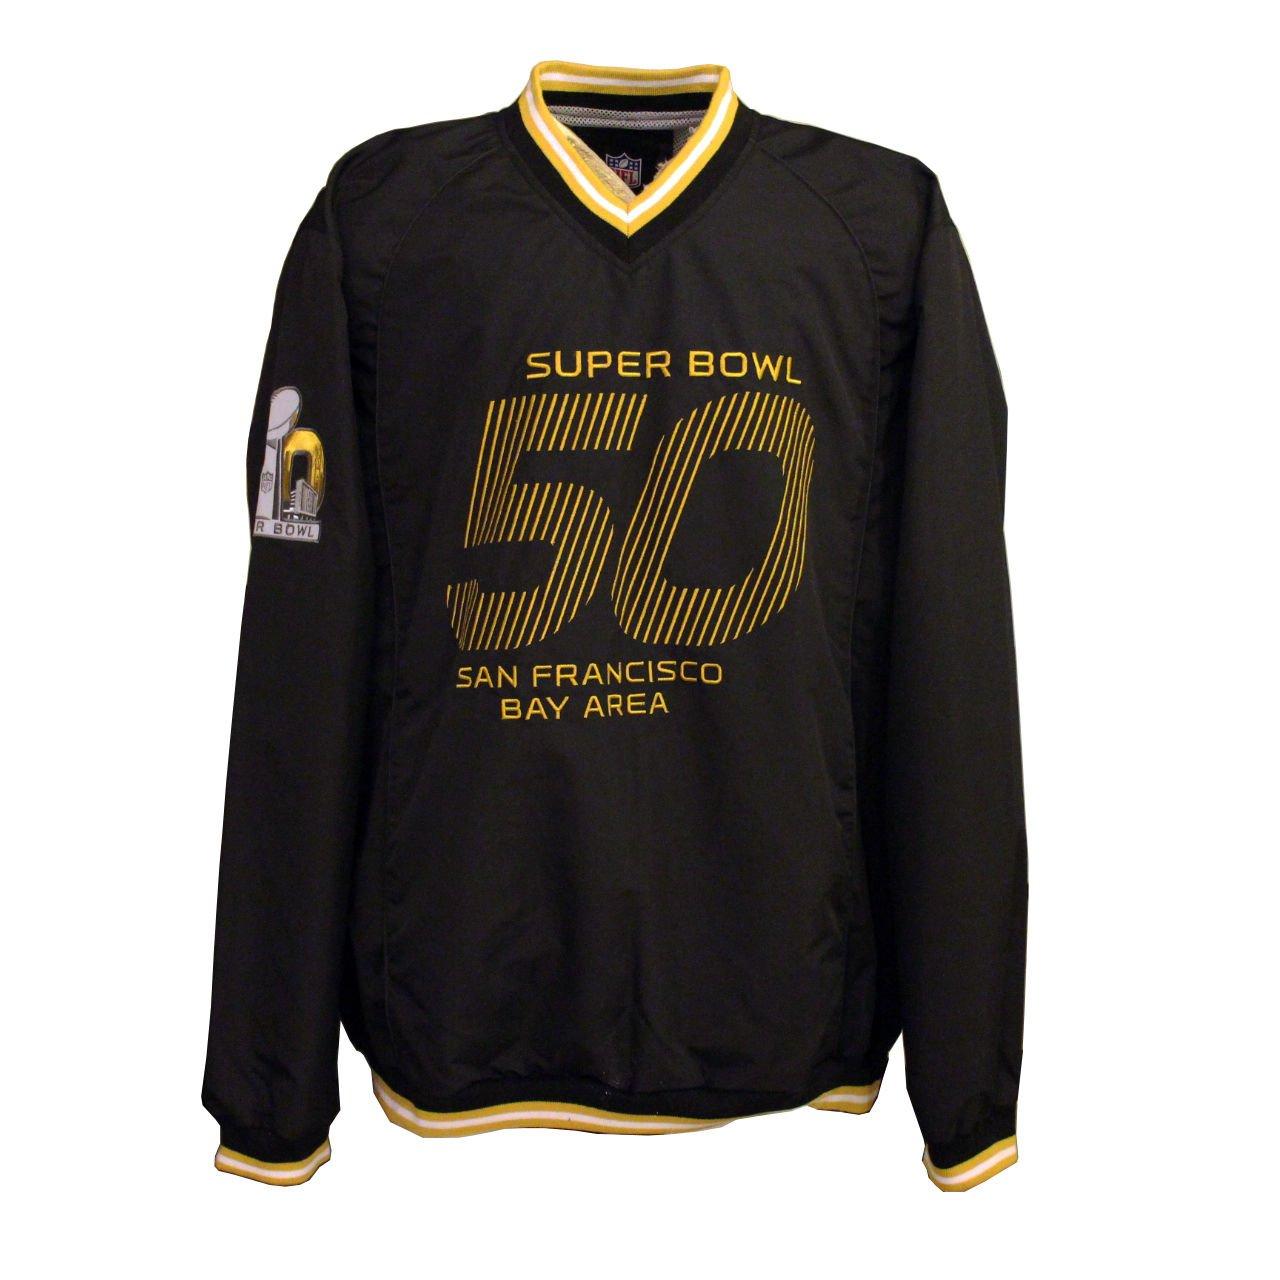 huge selection of ab2e3 4b2e6 Amazon.com : NFL Men's Super Bowl 50 V-Neck WindBreaker ...